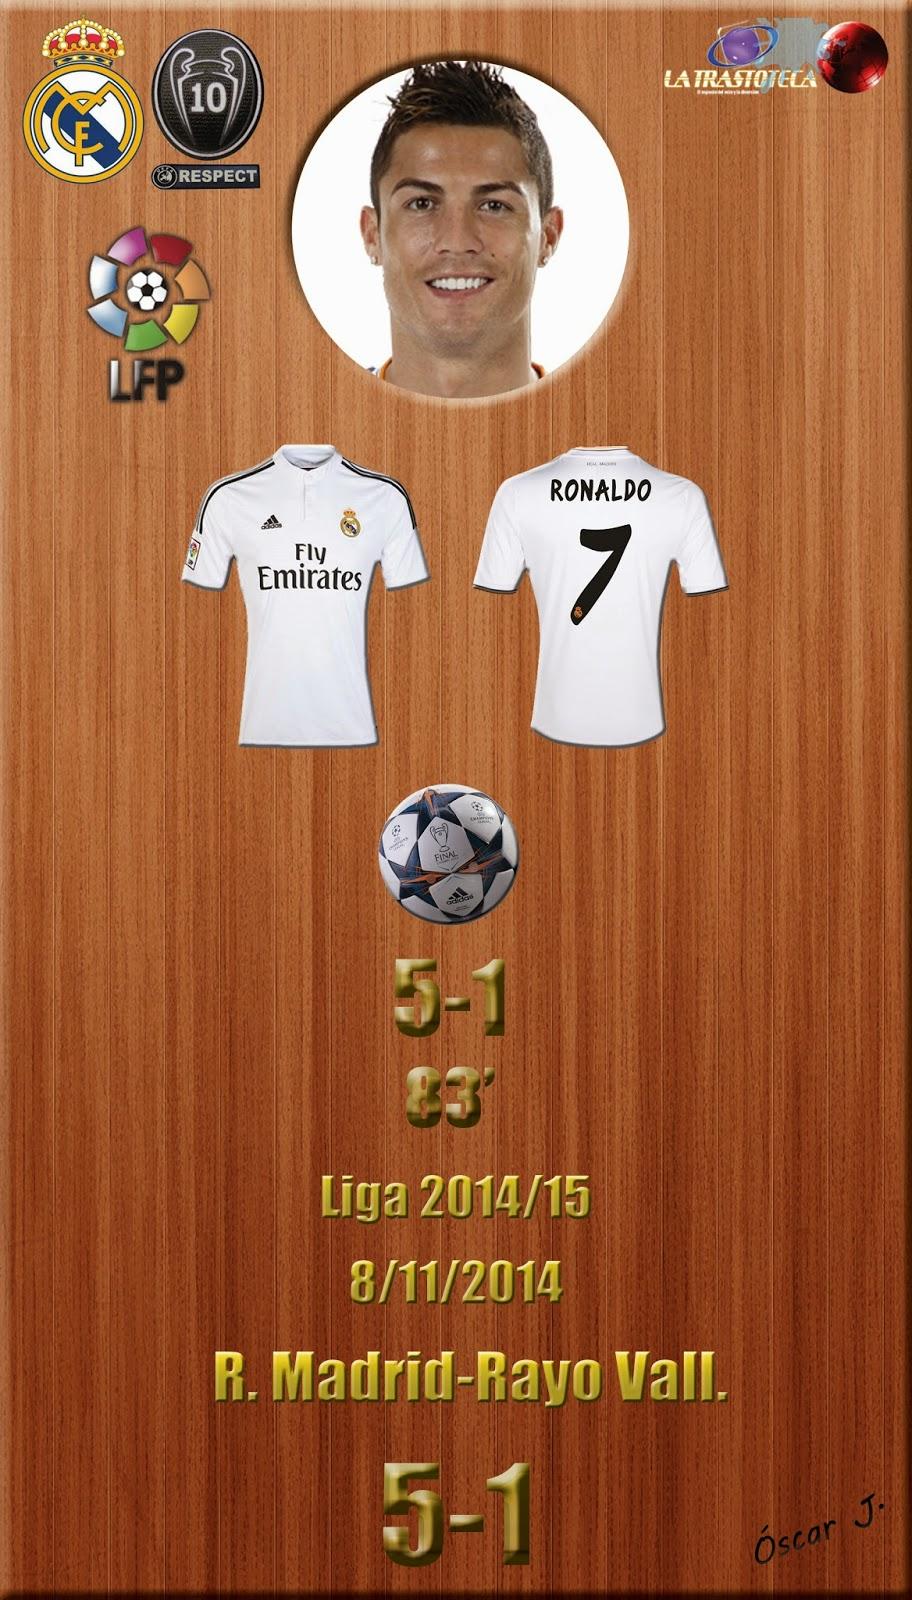 Cristiano Ronaldo - (5-1) - Real Madrid 5-1 Rayo - Liga 2014/15 - Jornada 11 - (8/11/2014)